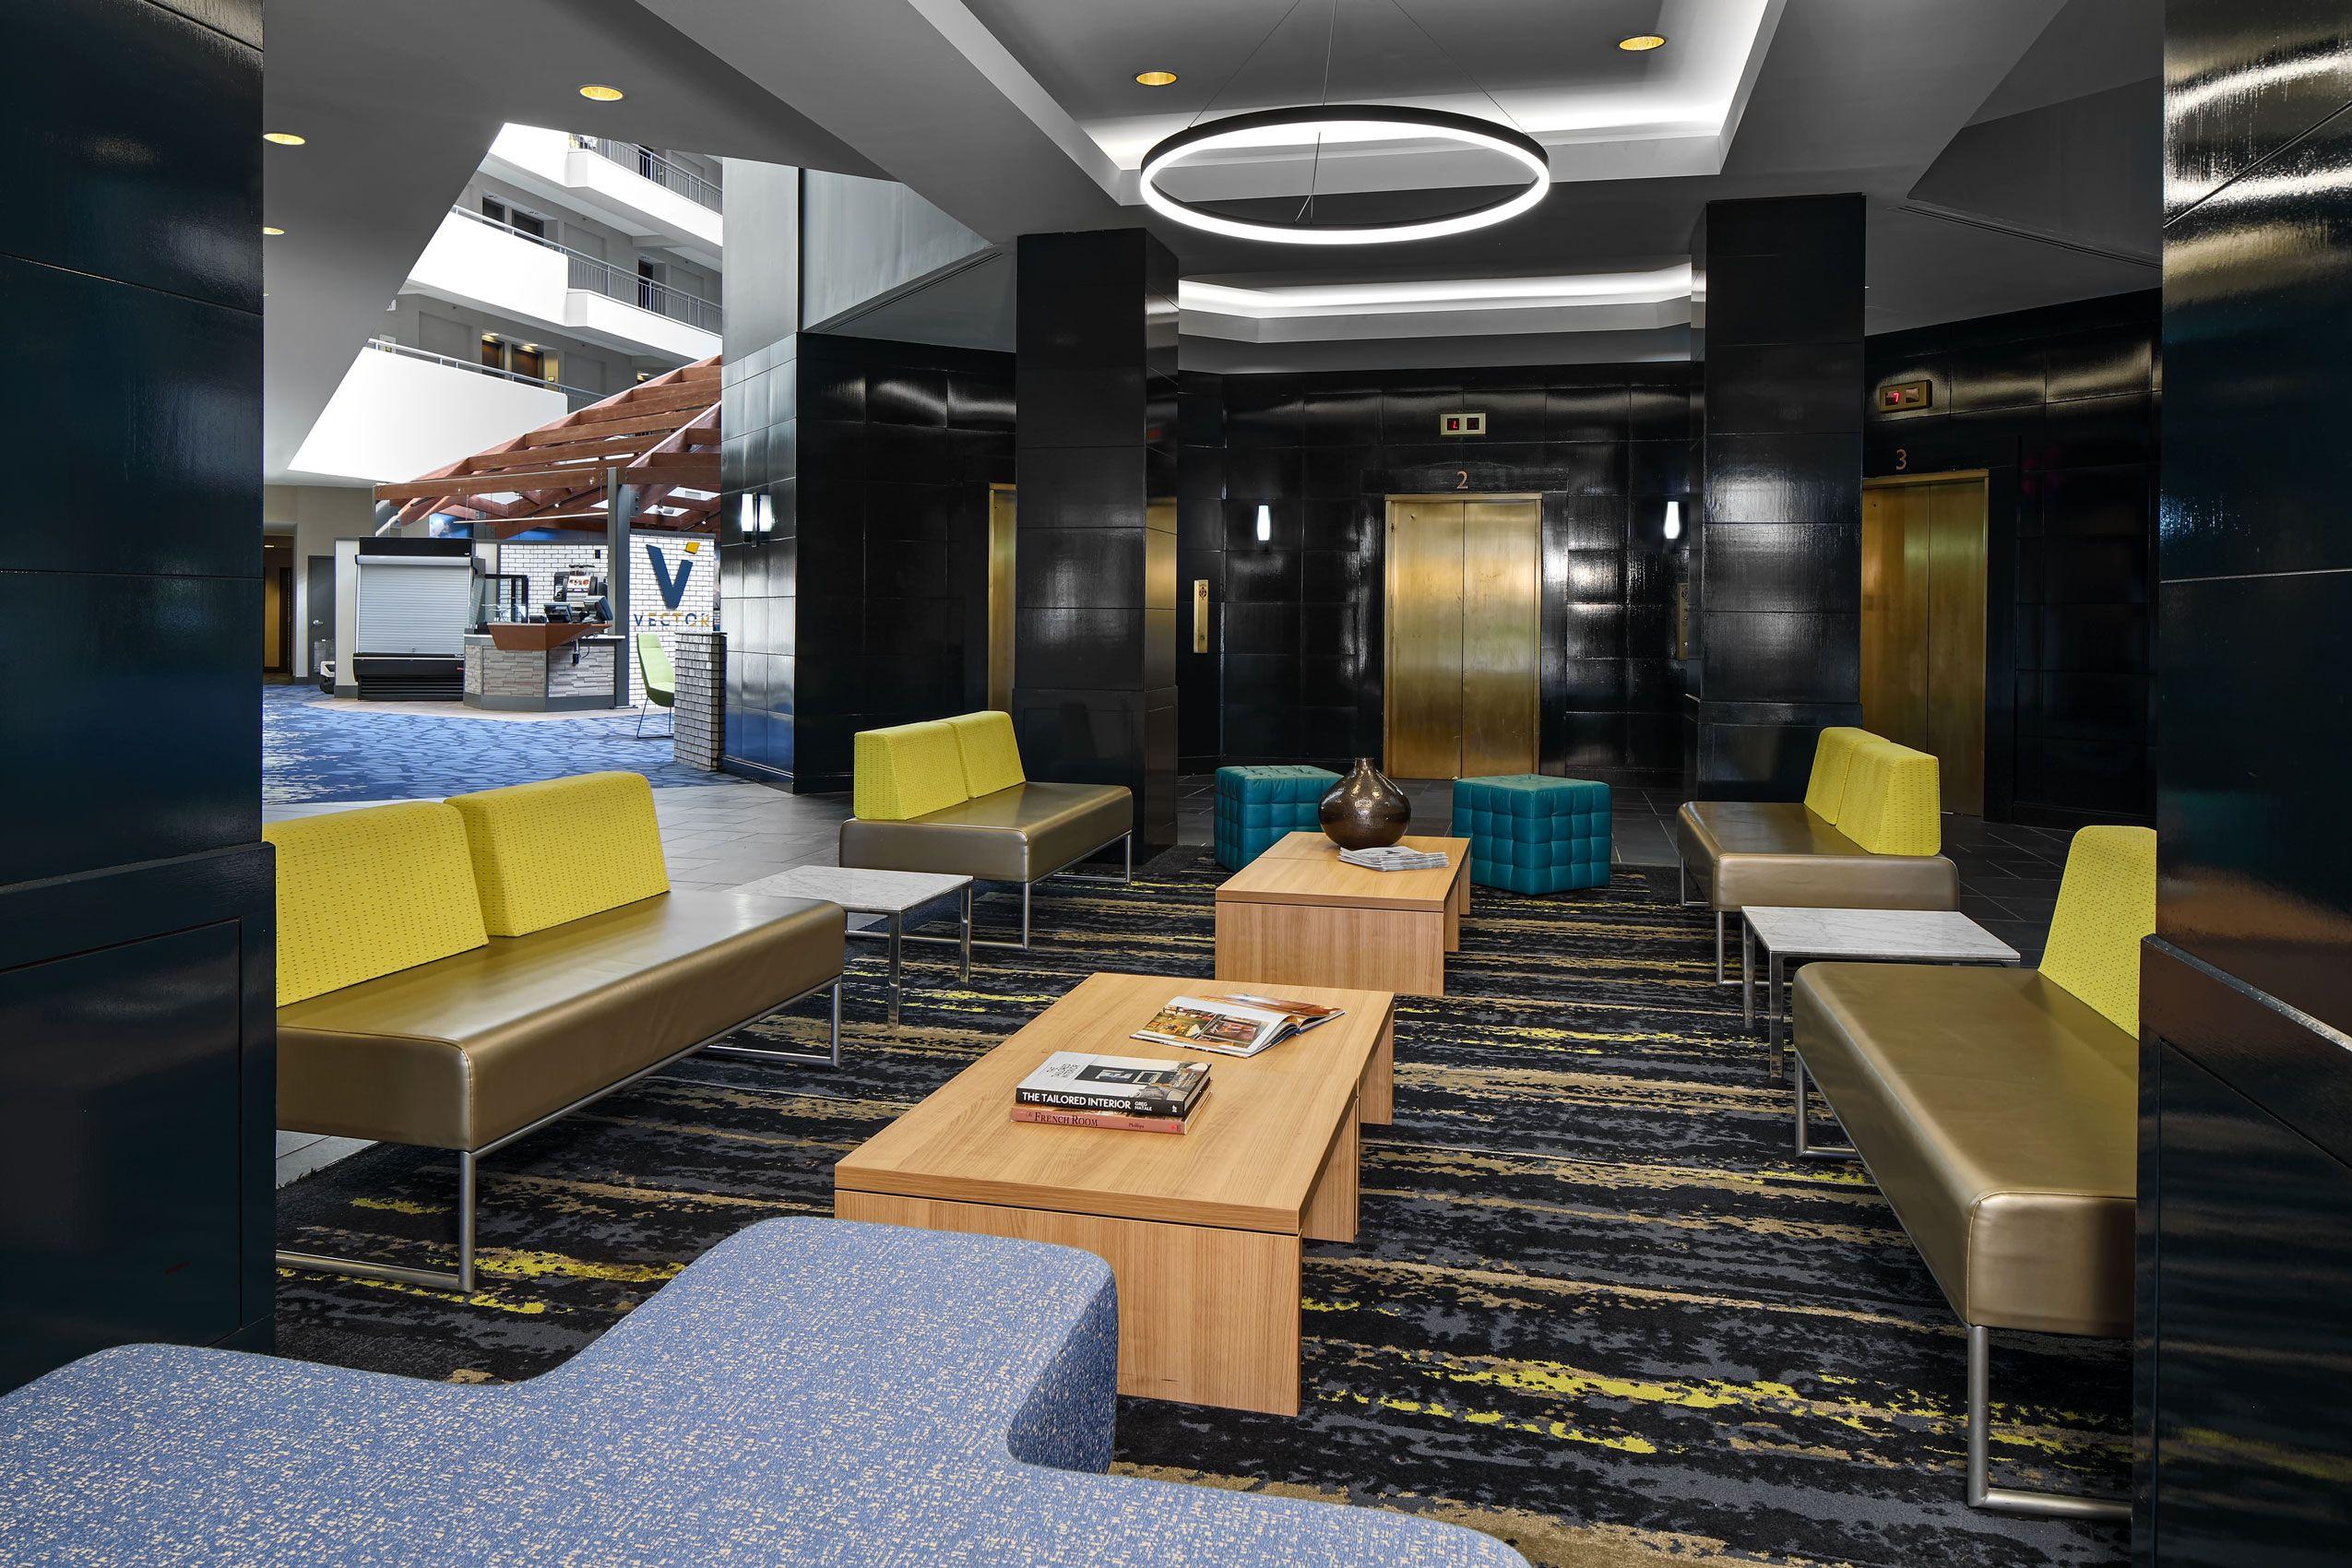 Sheraton Hotel PHL airport